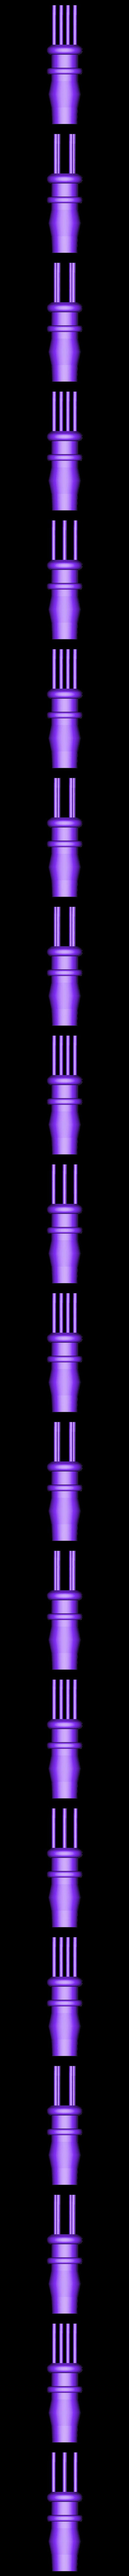 Thumper_v1_part2.stl Download free STL file Dune Thumper • Design to 3D print, poblocki1982